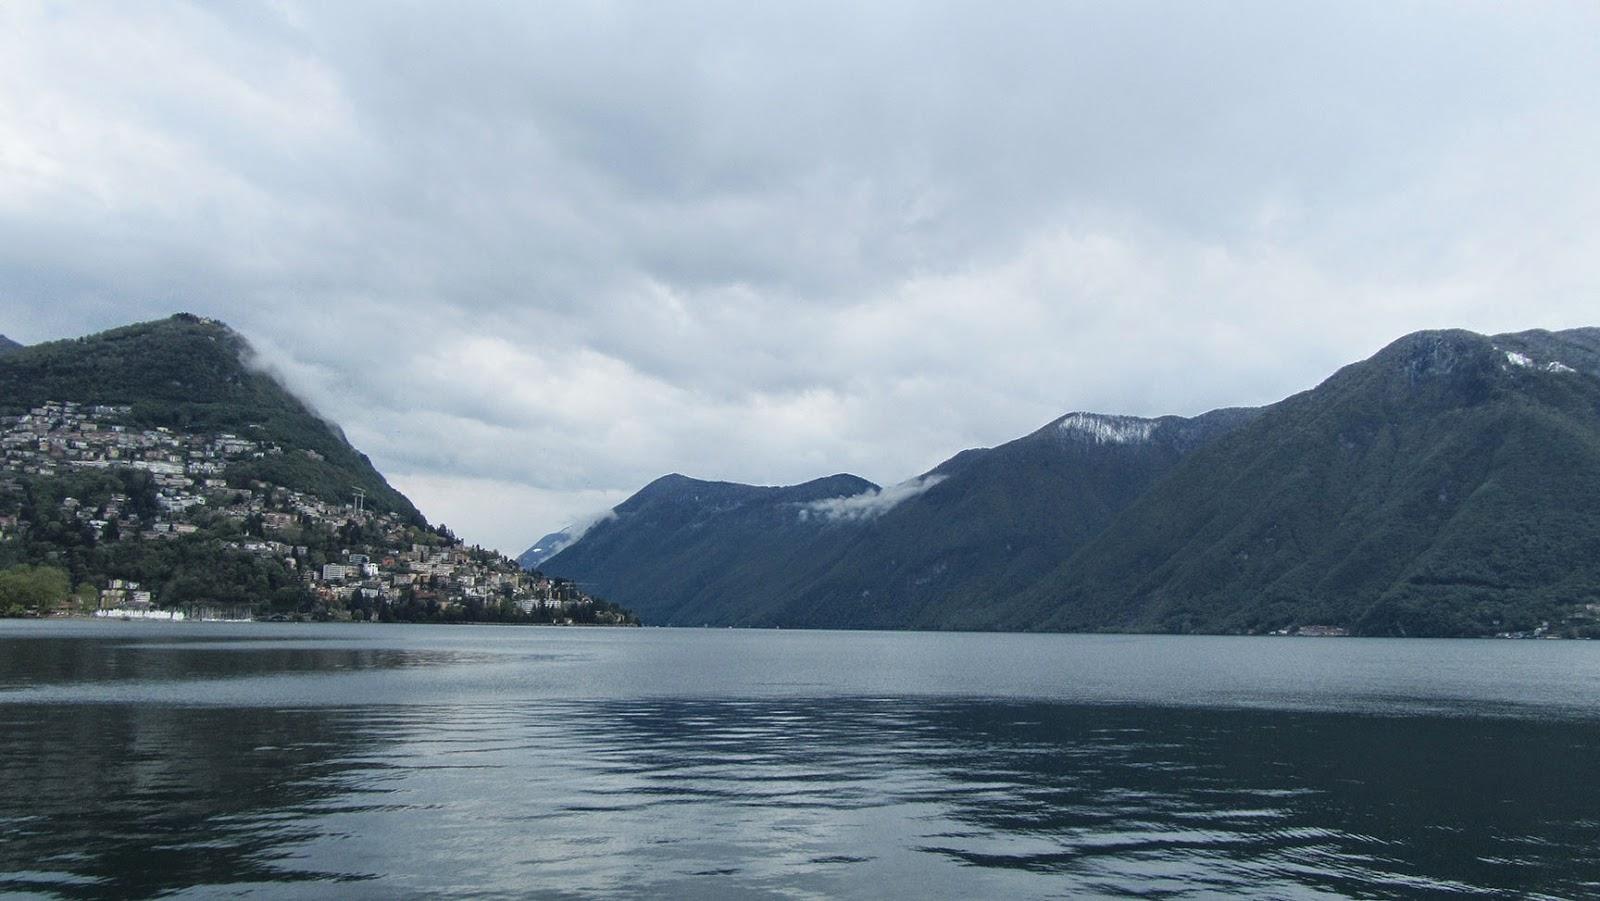 Ticino_Lugano San Salvatore